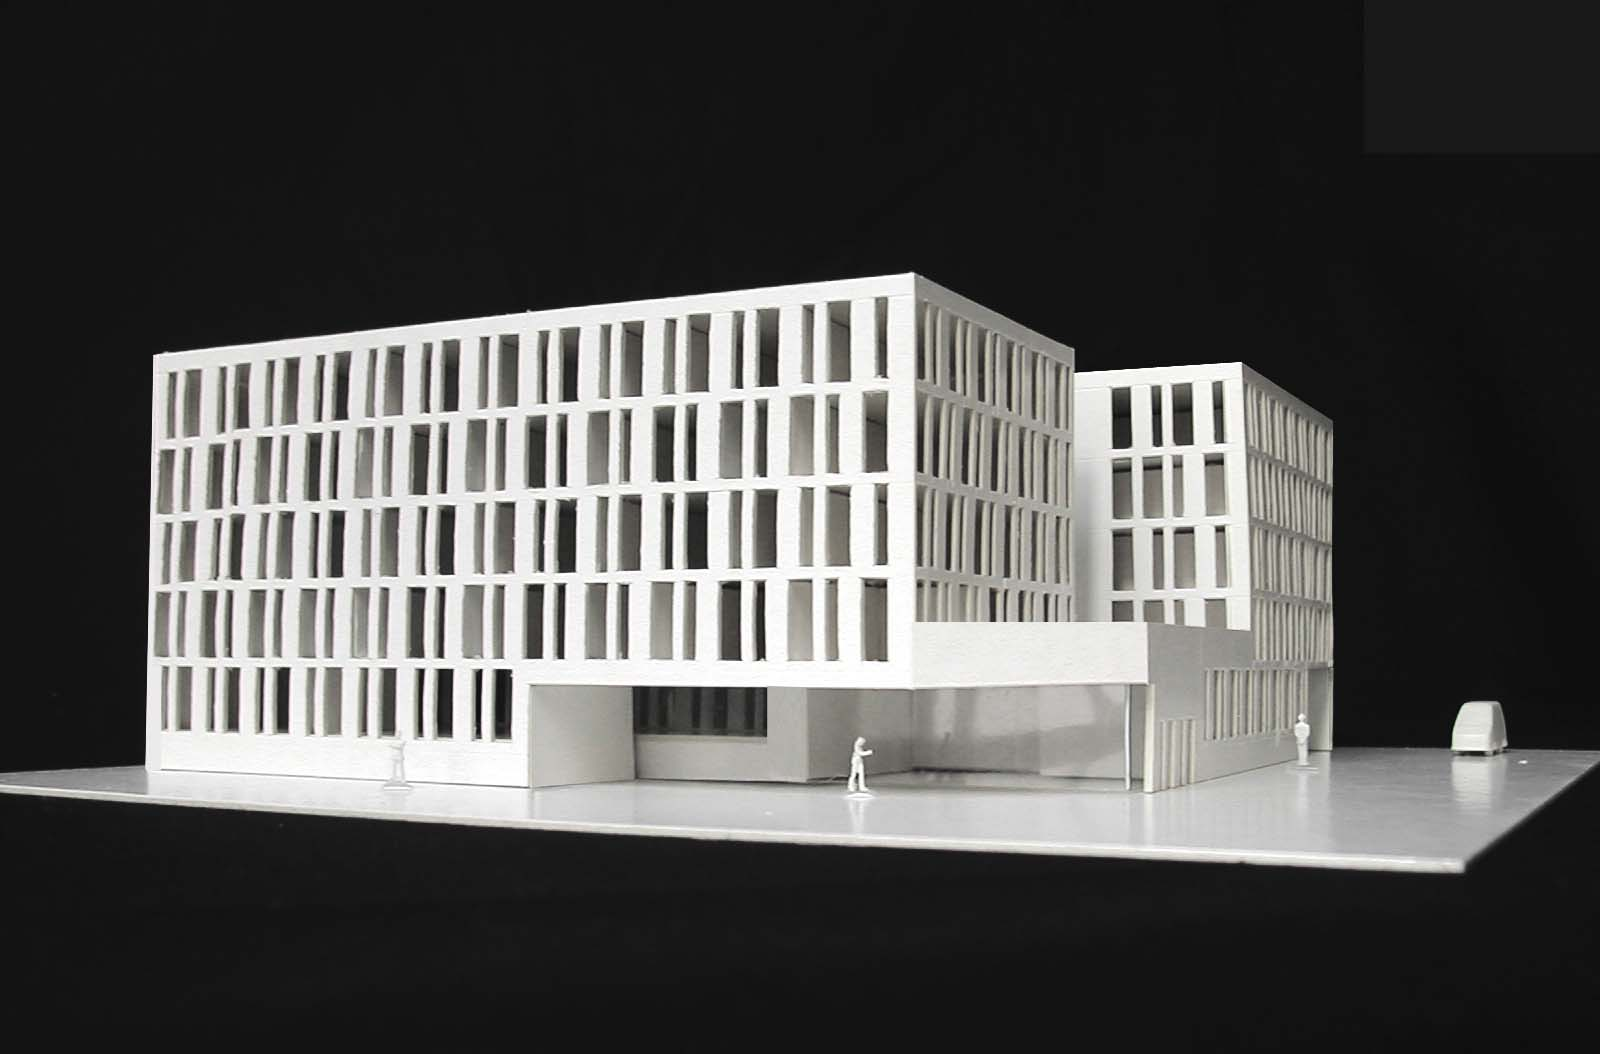 VALLECAS 35 BUILDING. 51 DWELLINGS  | Madrid